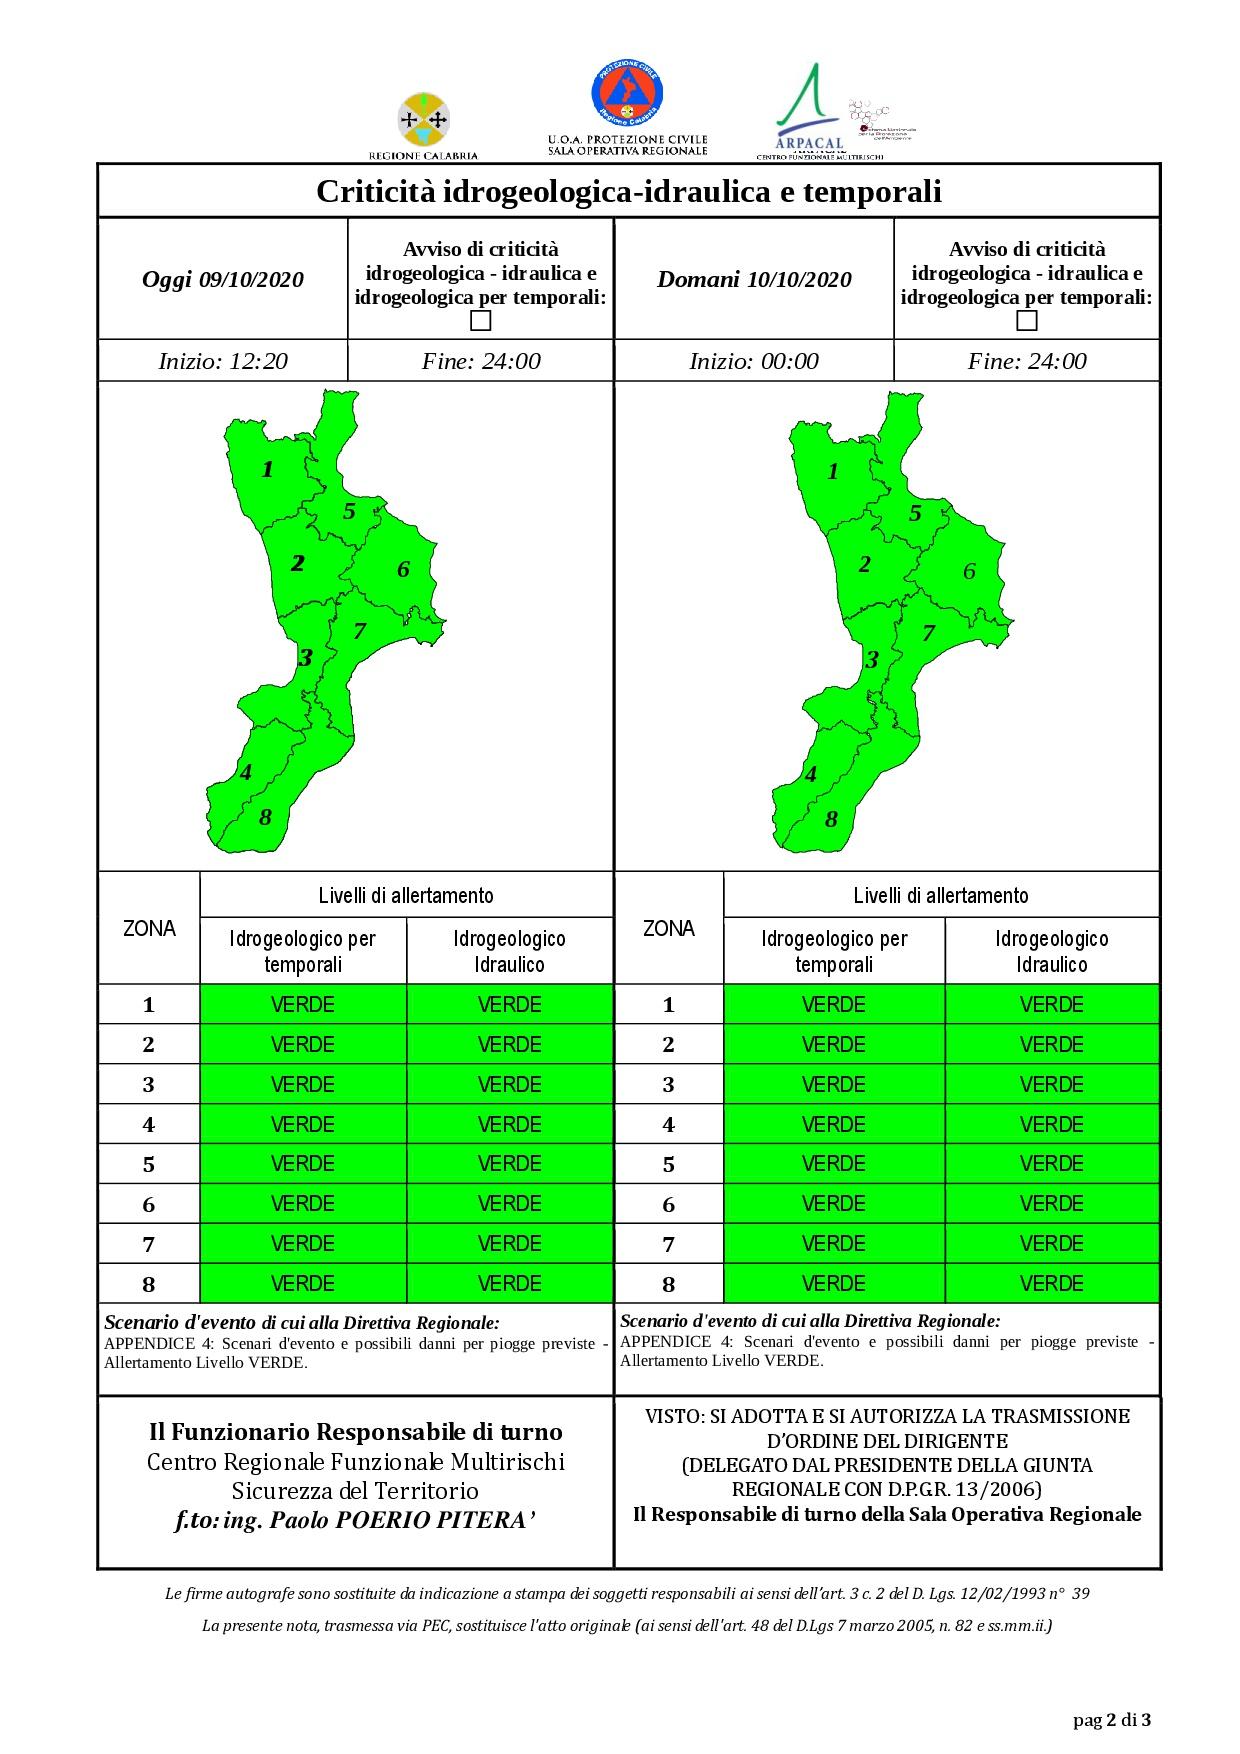 Criticità idrogeologica-idraulica e temporali in Calabria 09-10-2020